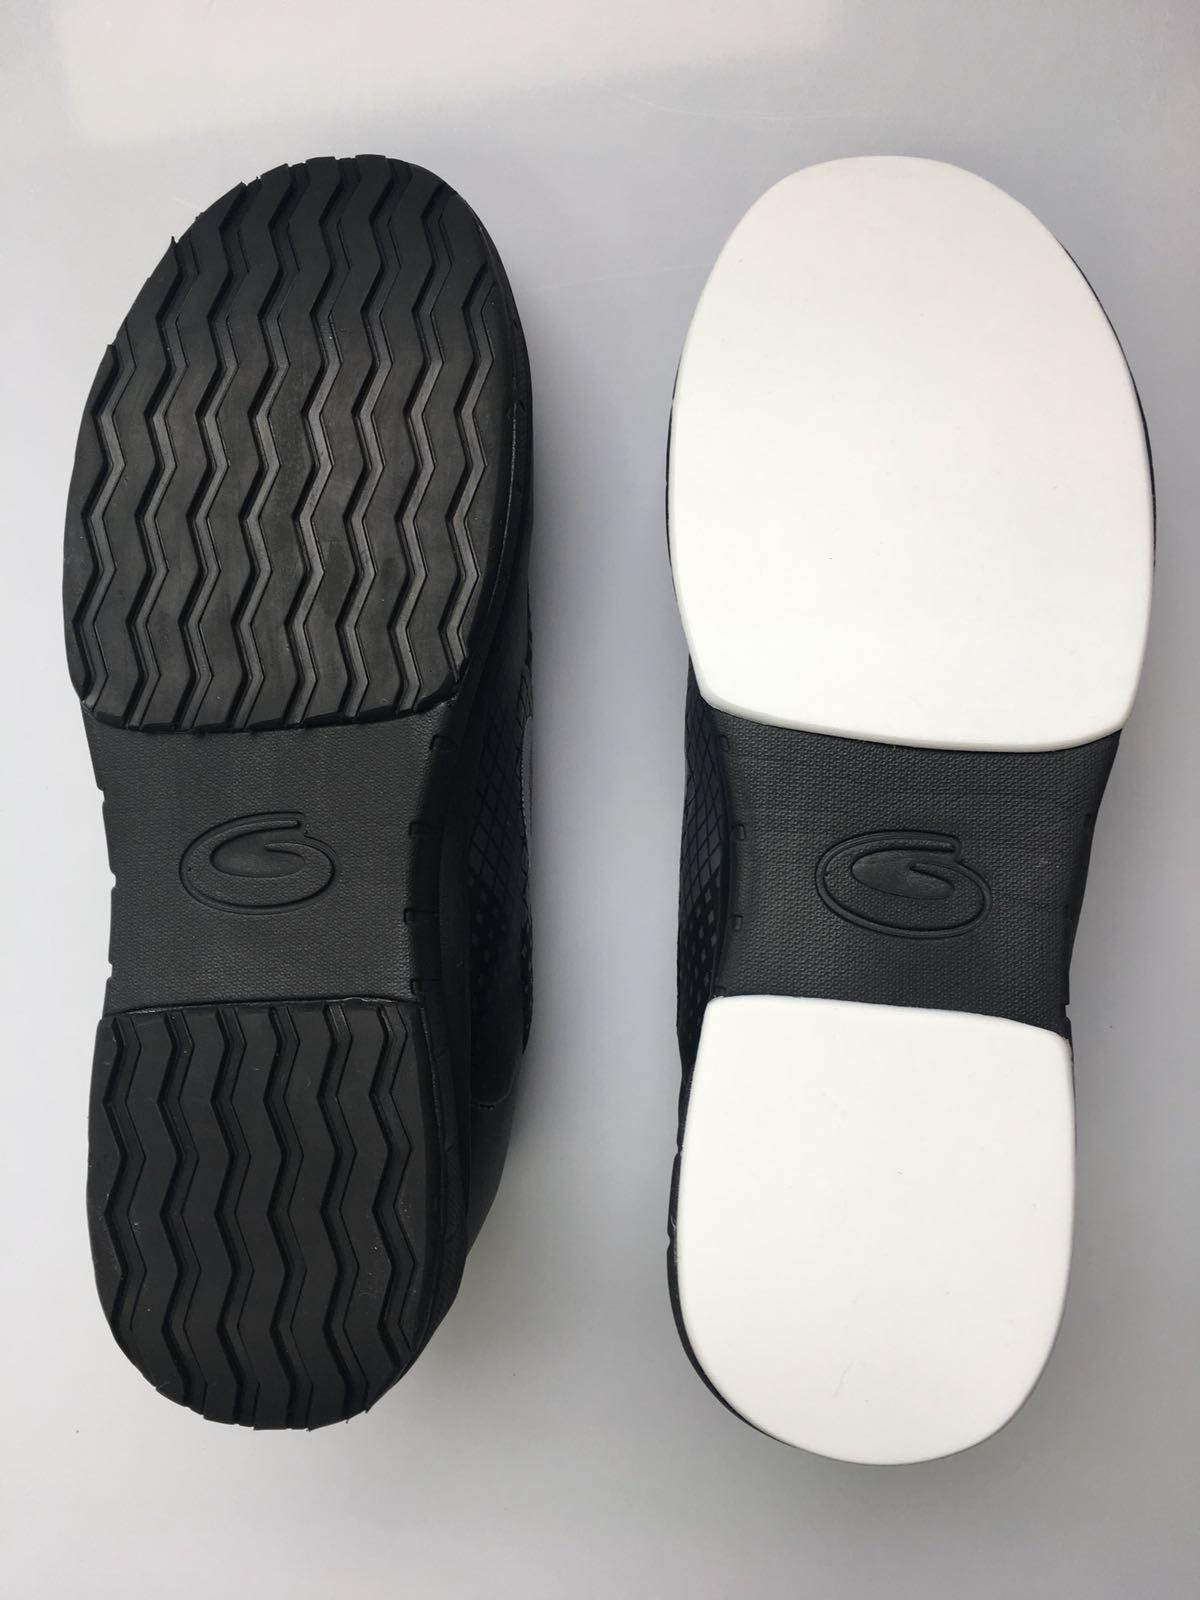 0c622893ba2c0 Mens G50 Breeze Curling Shoes  (Speed 5 ) - 8.5 Goldline Curling Top ...